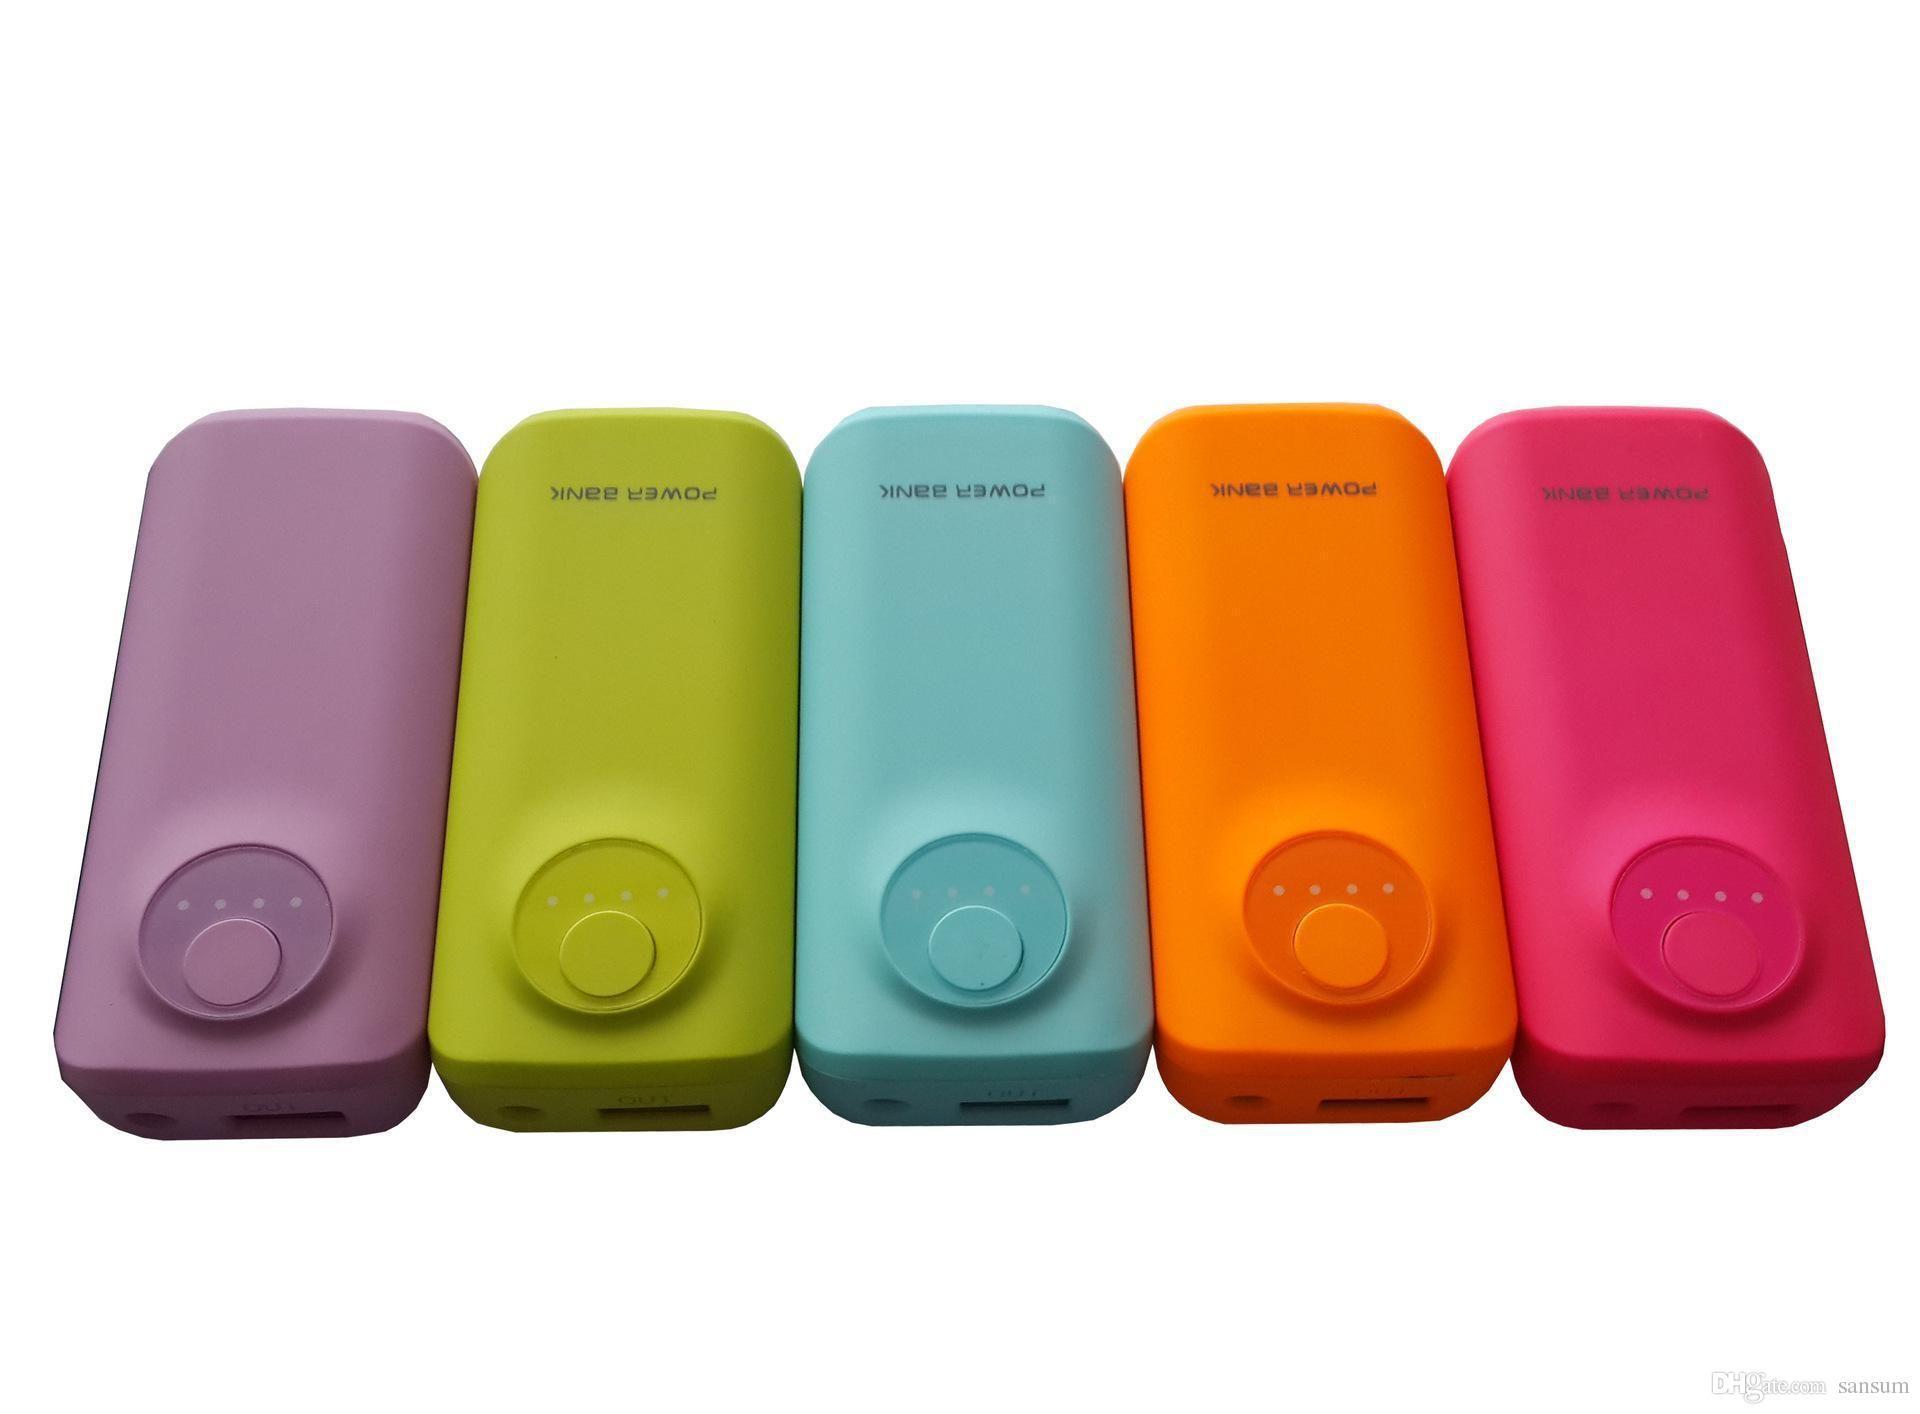 Banco de potência de Borracha Pequeno peixe boca óleo 5000 mah carregador portátil Carregador de Bateria externa poderes de backup Para samsung iphone ipad todos os modelos